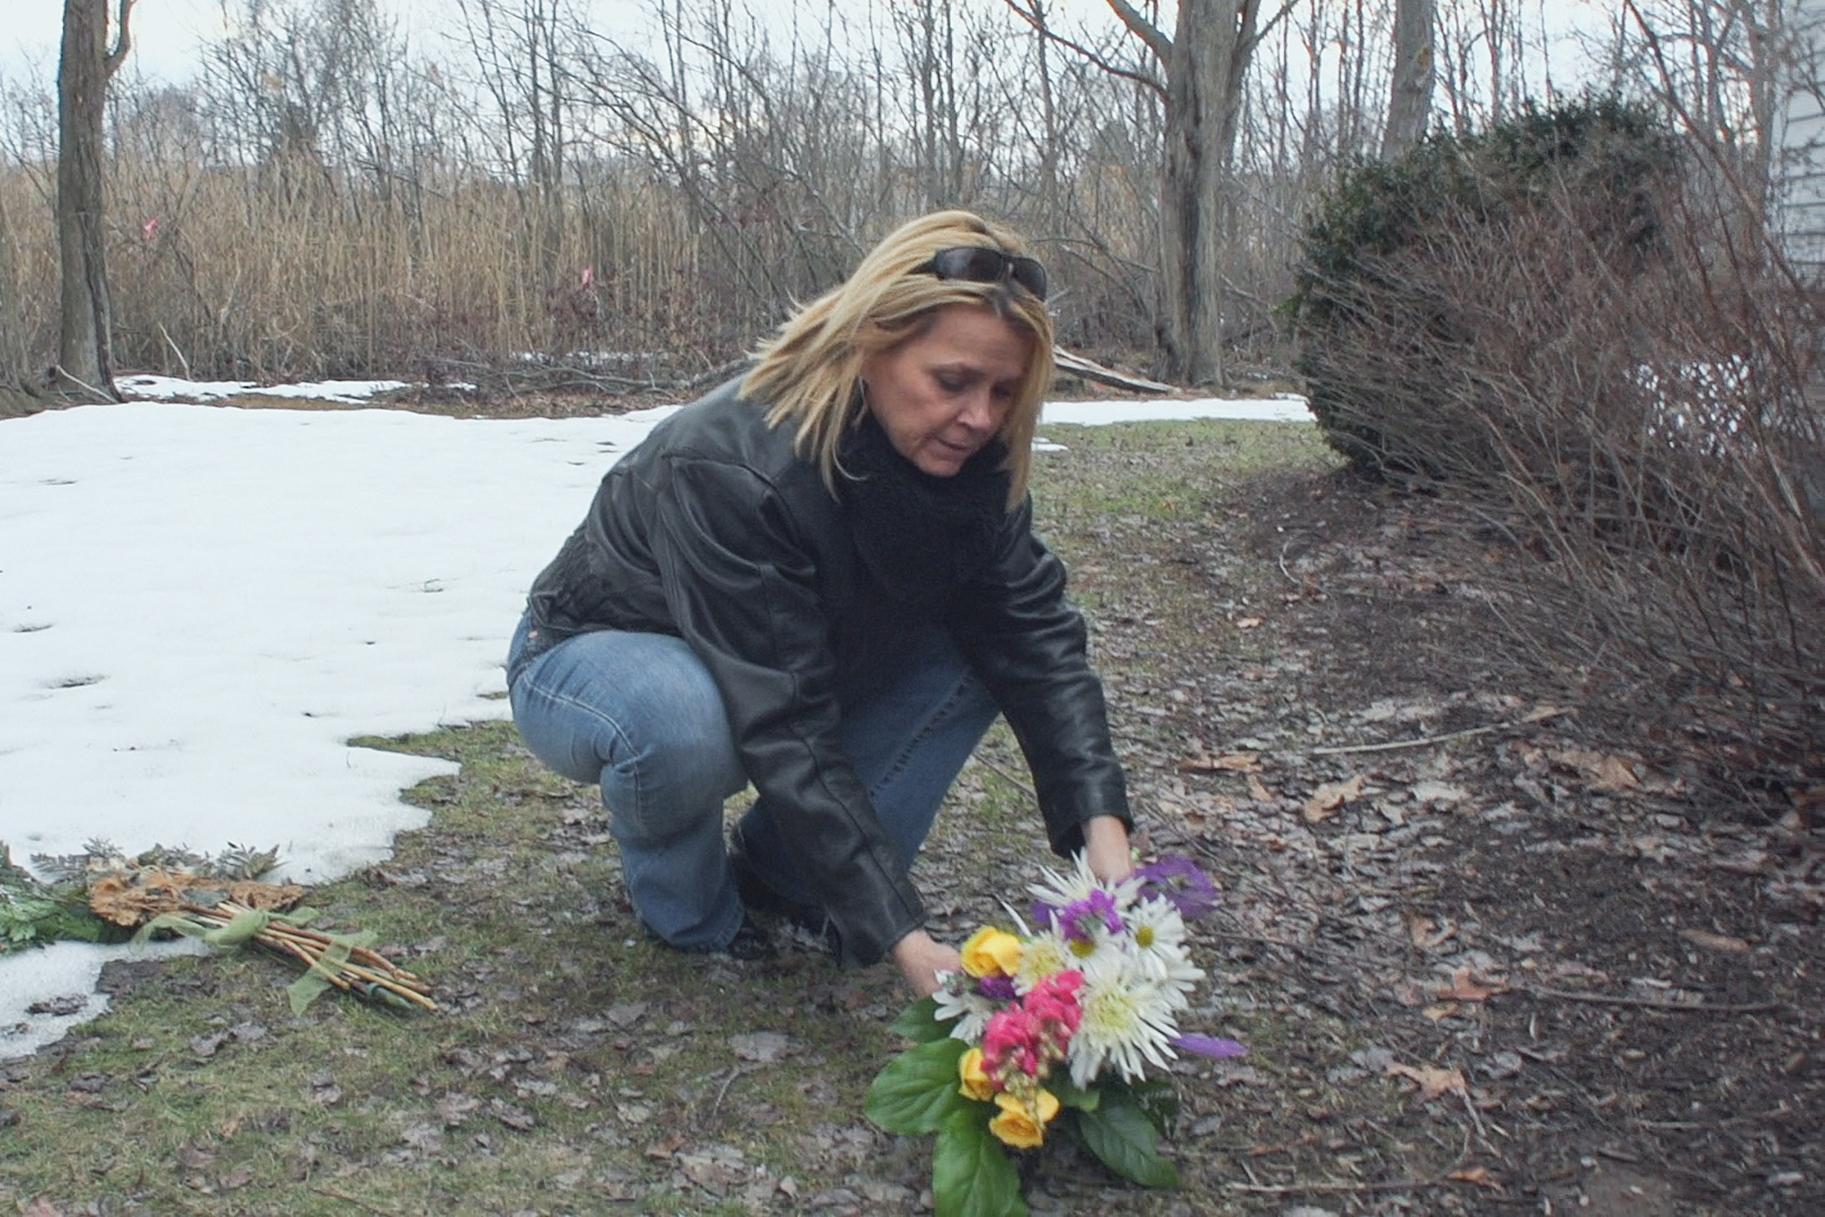 Miks üritas Conway Beach kord palgata hitmani, et tappa oma õde Barbara Hamburgi?